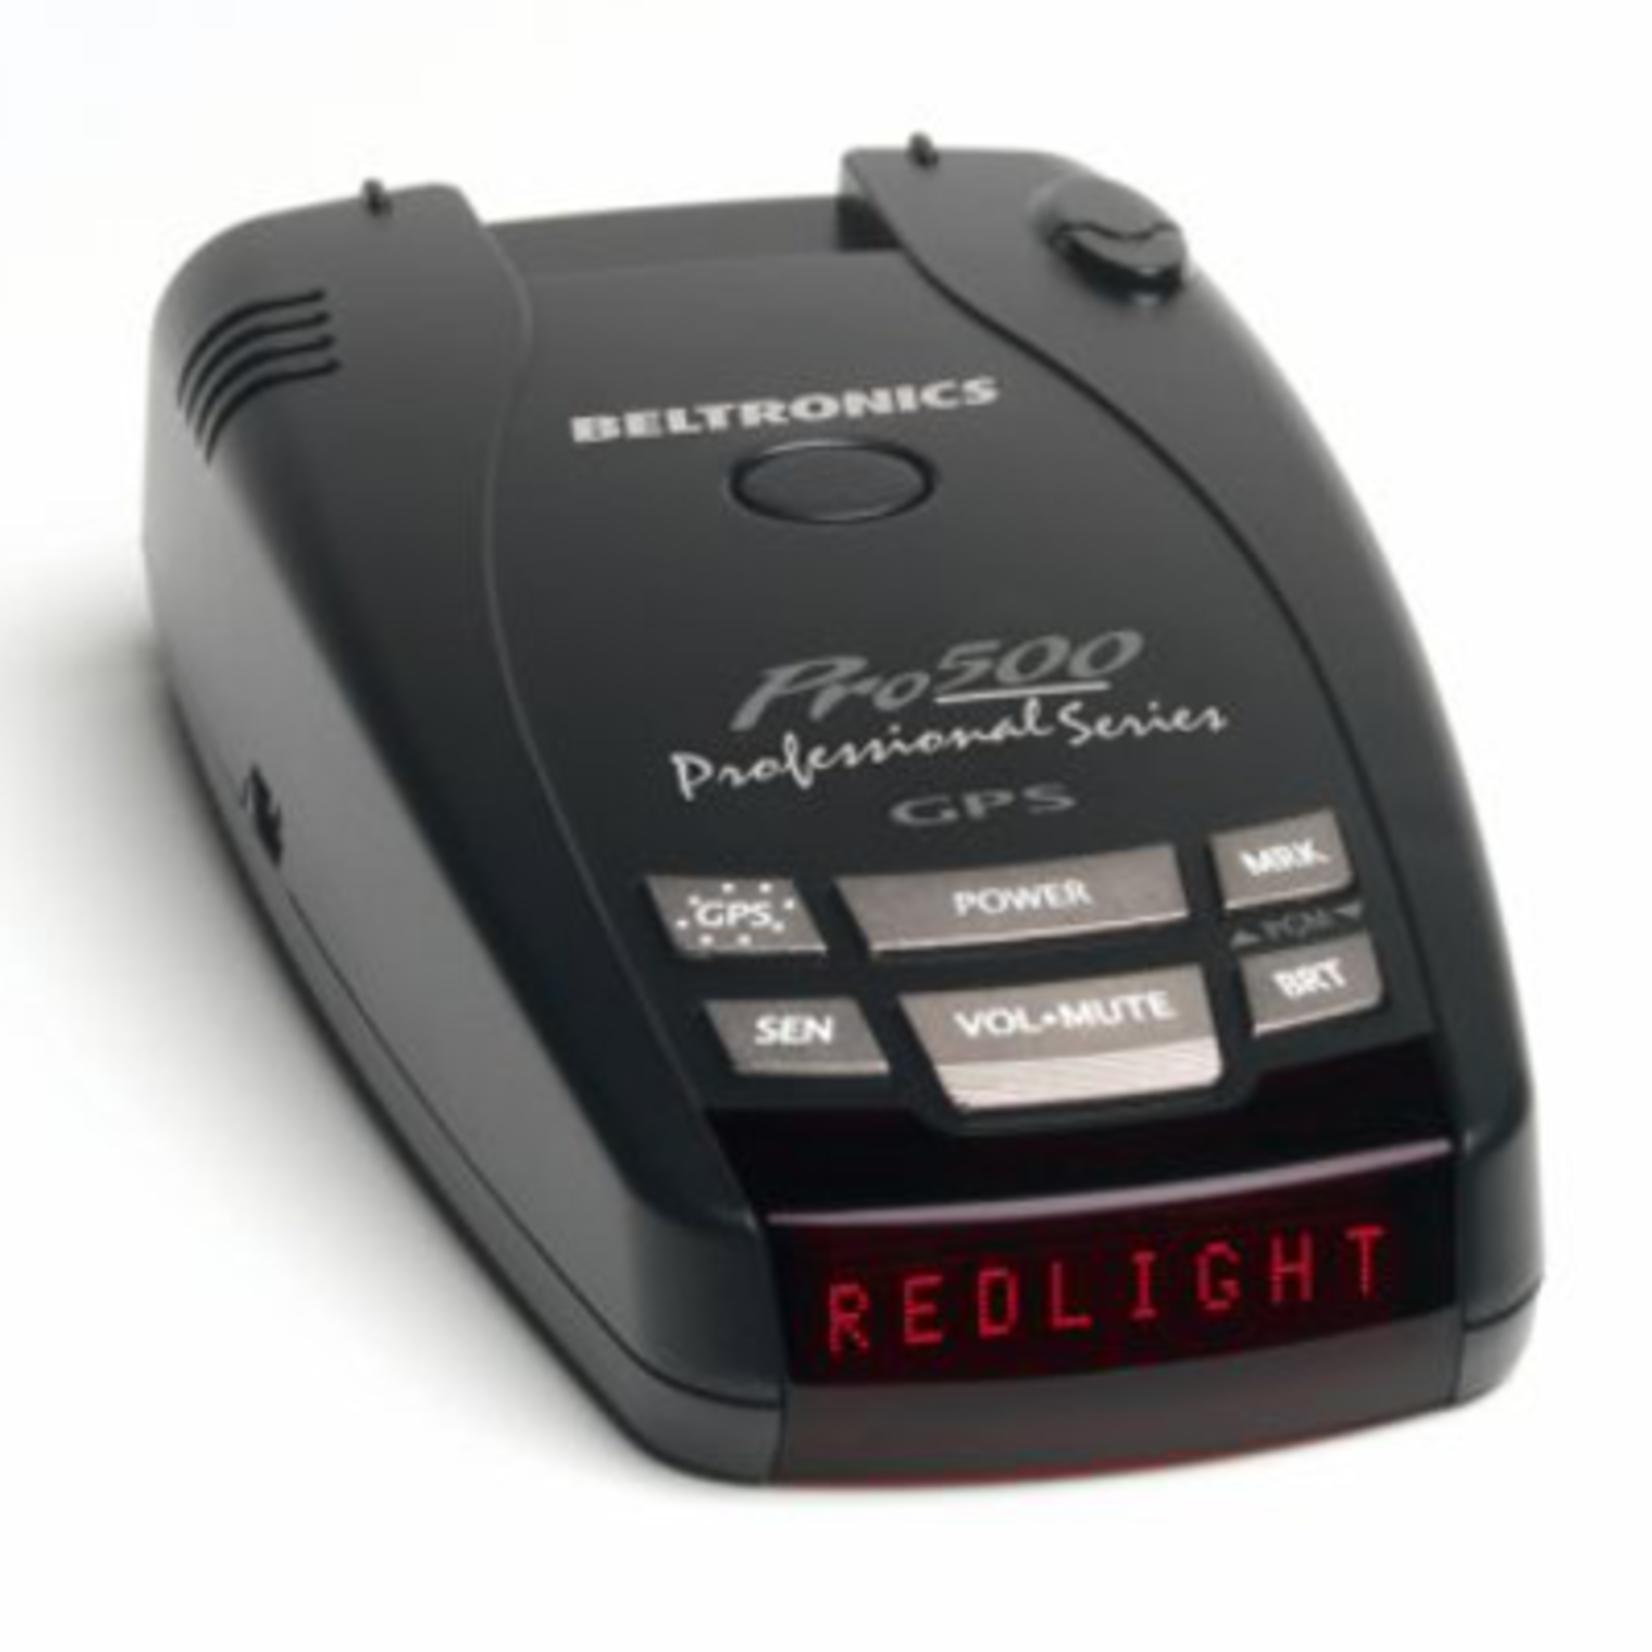 Beltronics Pro 500 Radar Dectector with GPS Camera Database *Open box